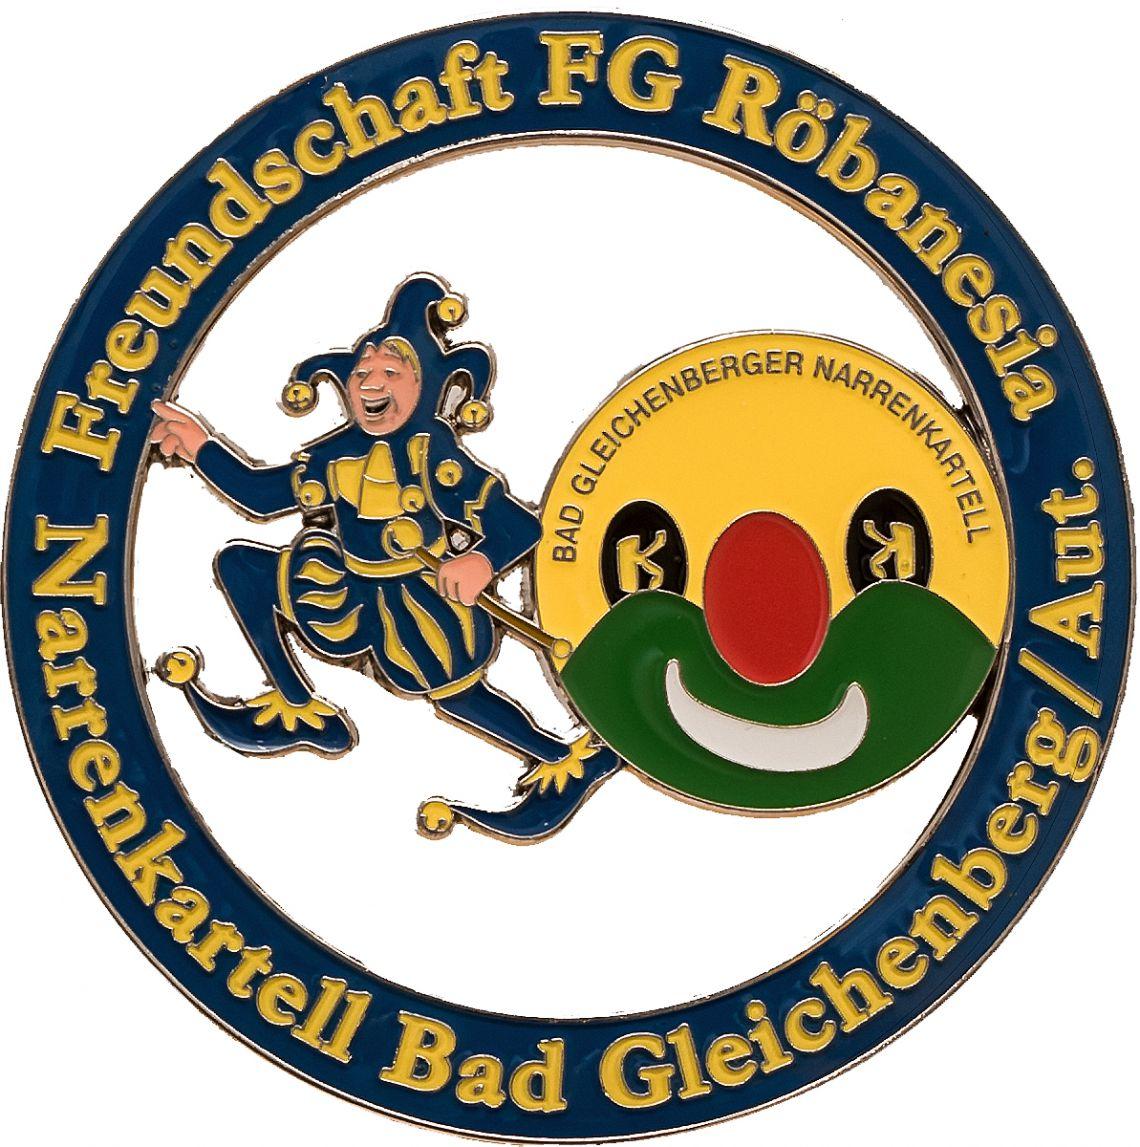 FG Röbanesia - Partner des Narrenkartells Bad Gleichenberg